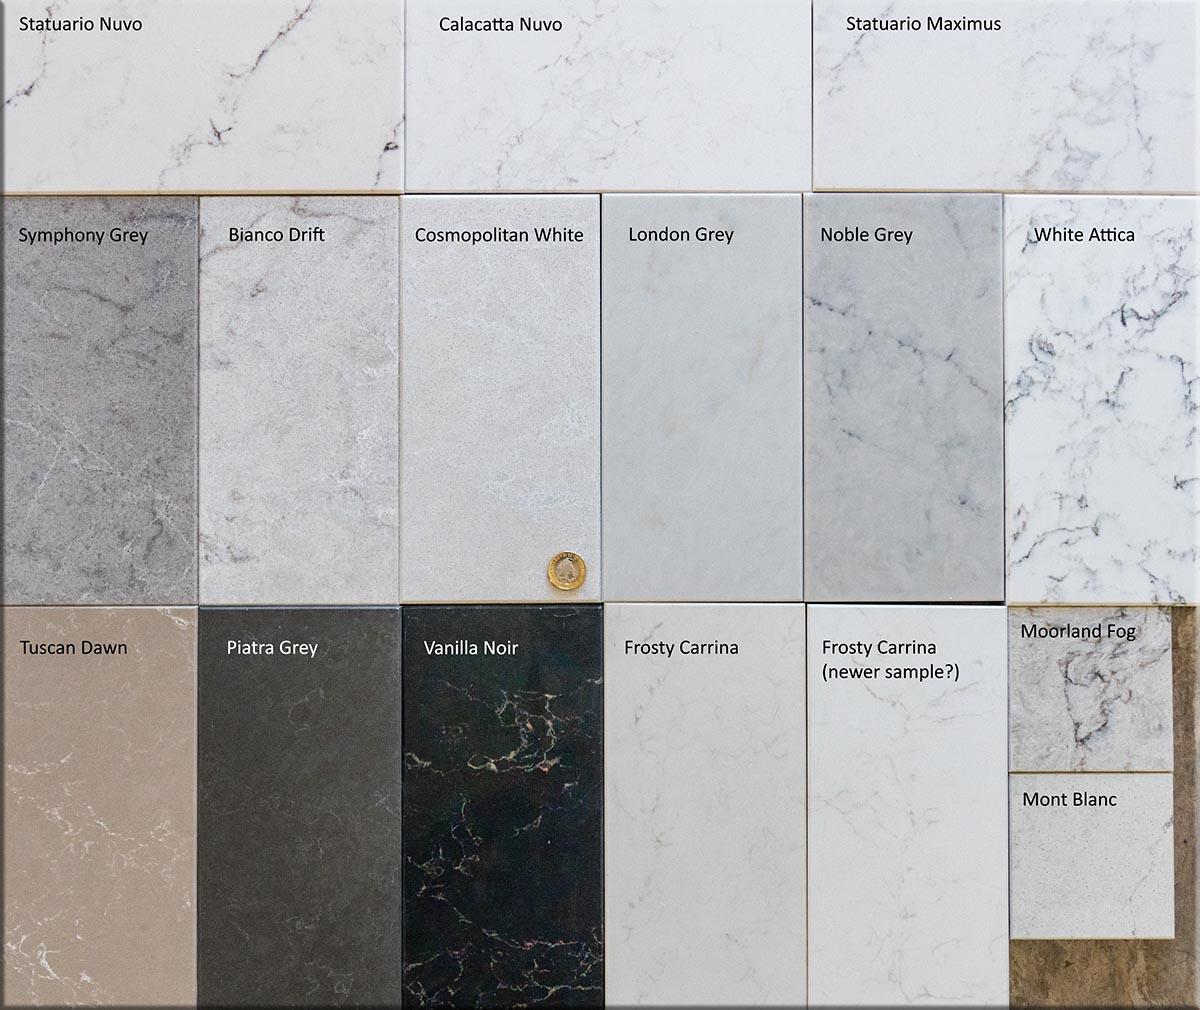 Caesarstone Marbled Quartz Groups 4 And 5a Affordable Granite Surrey Ltd